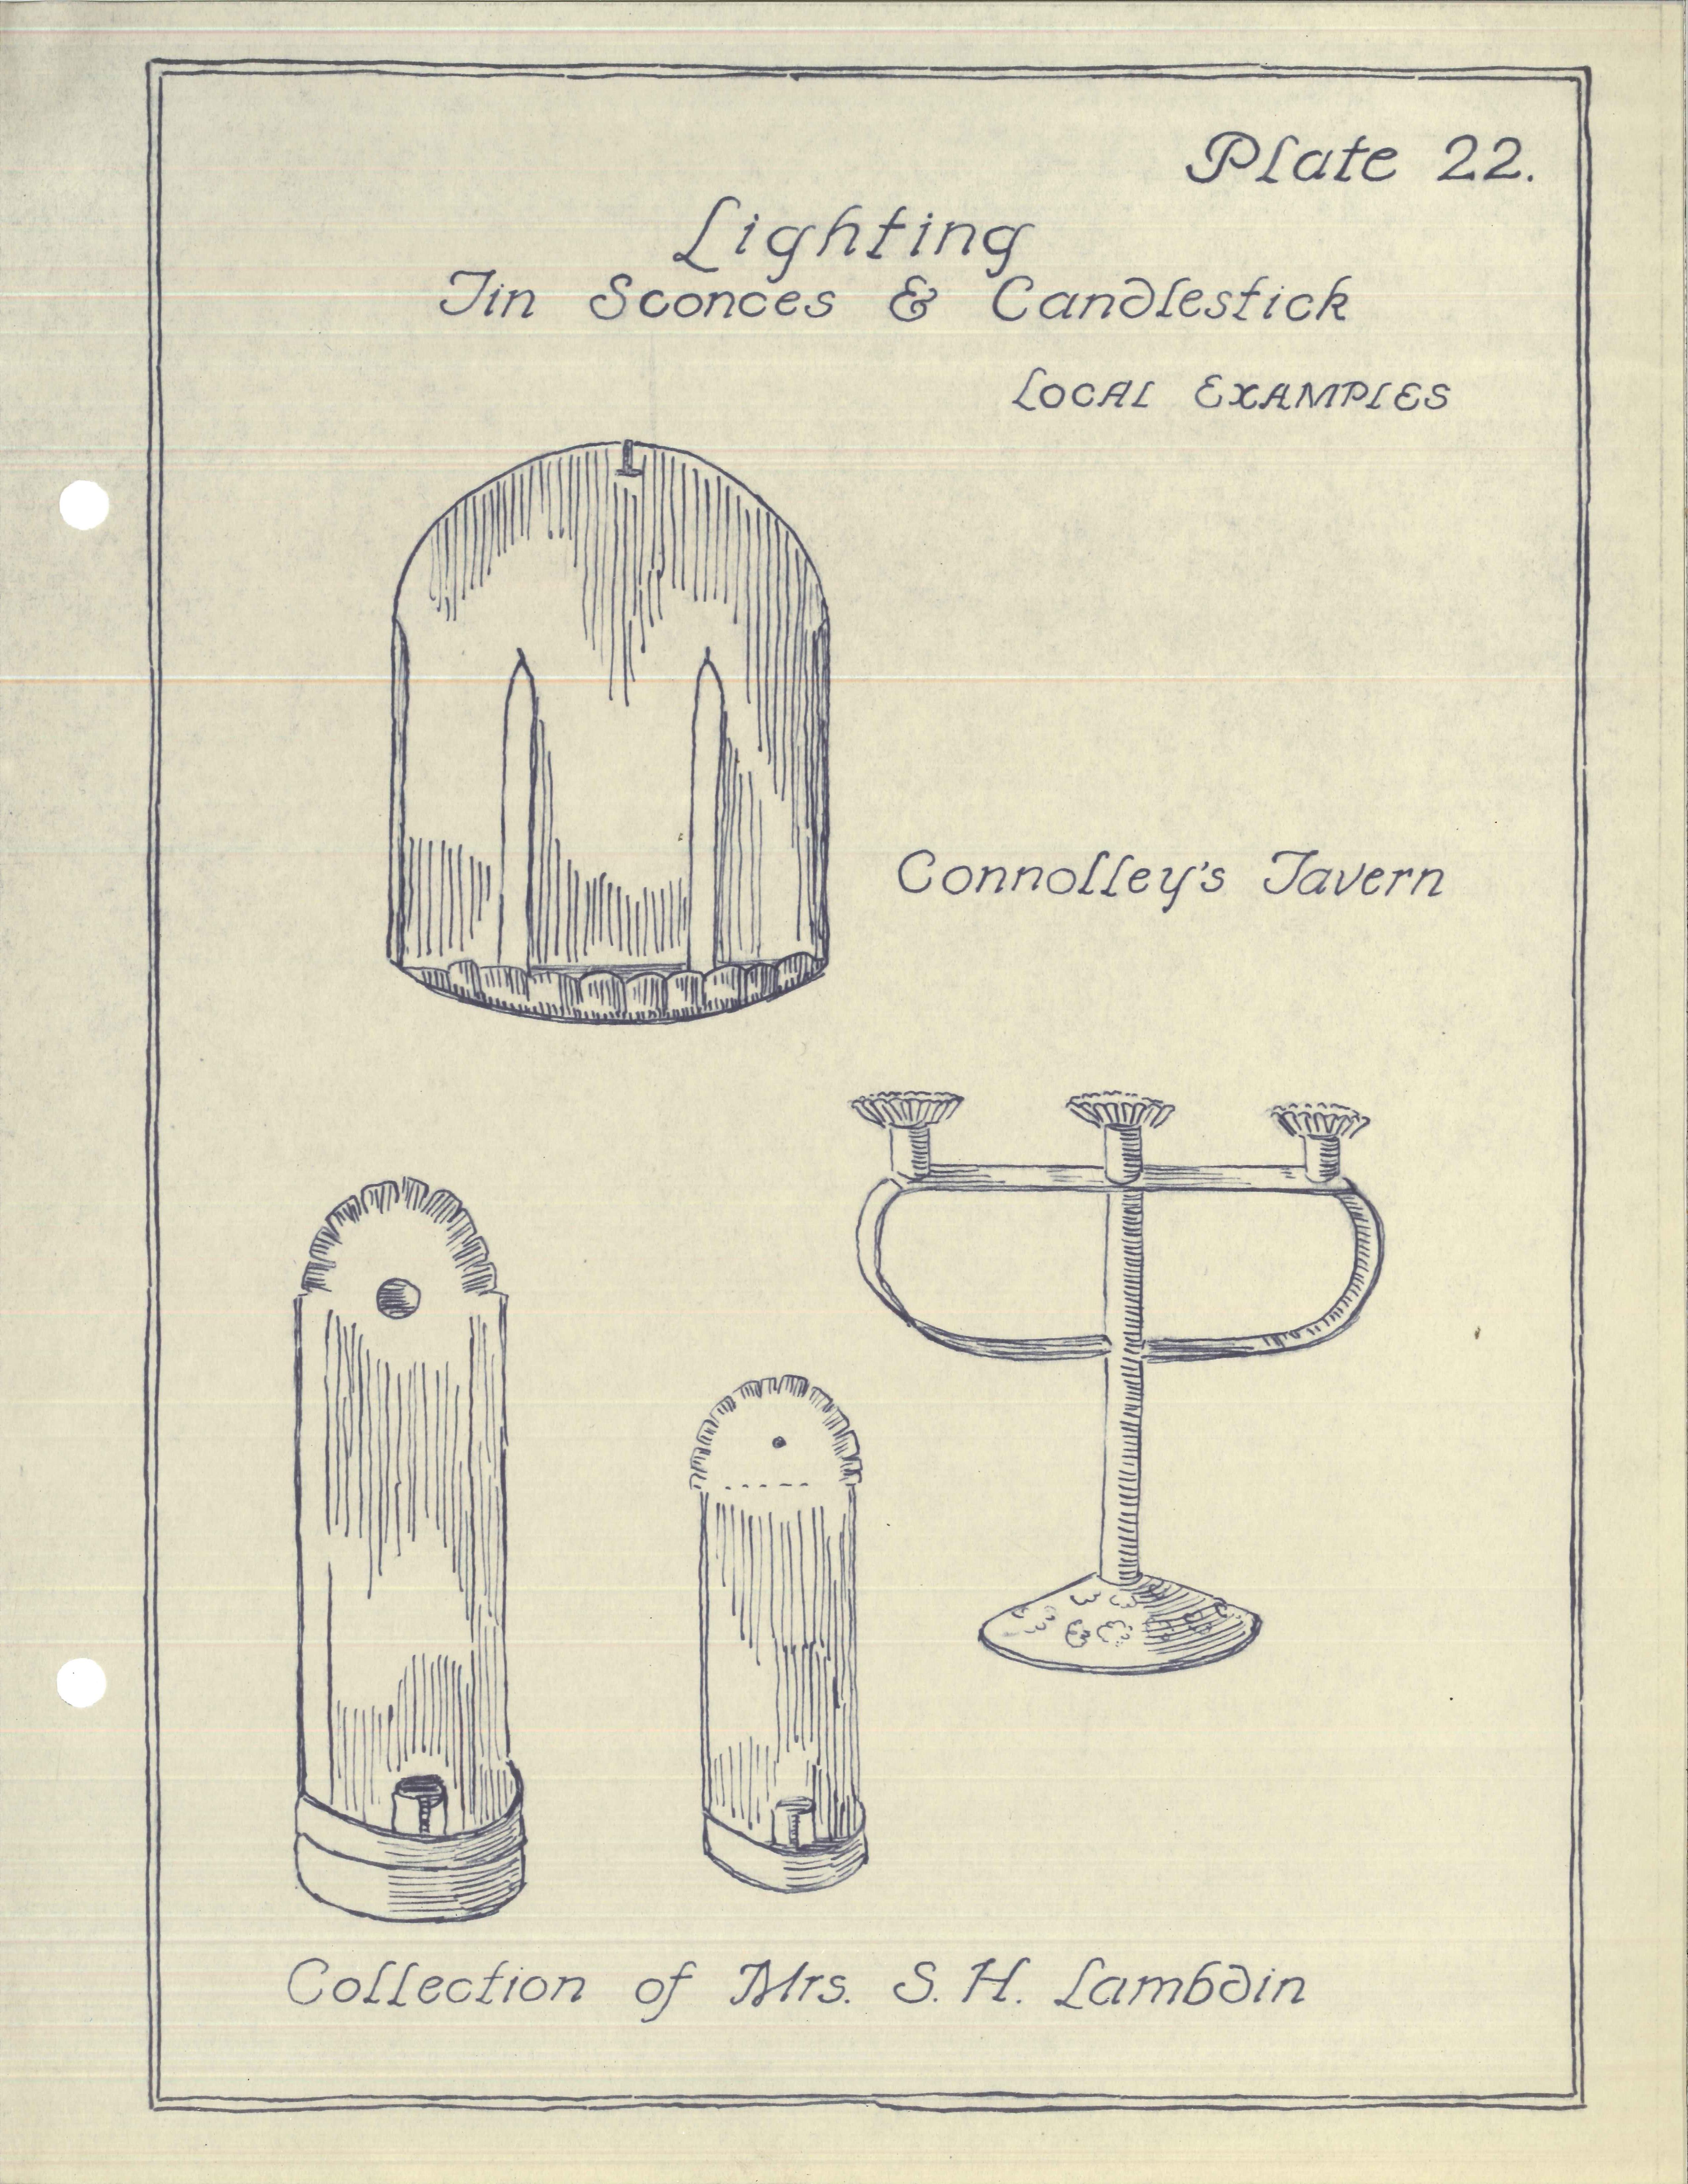 Plate 22, Lighting, Tin Sconces & Candlesticks